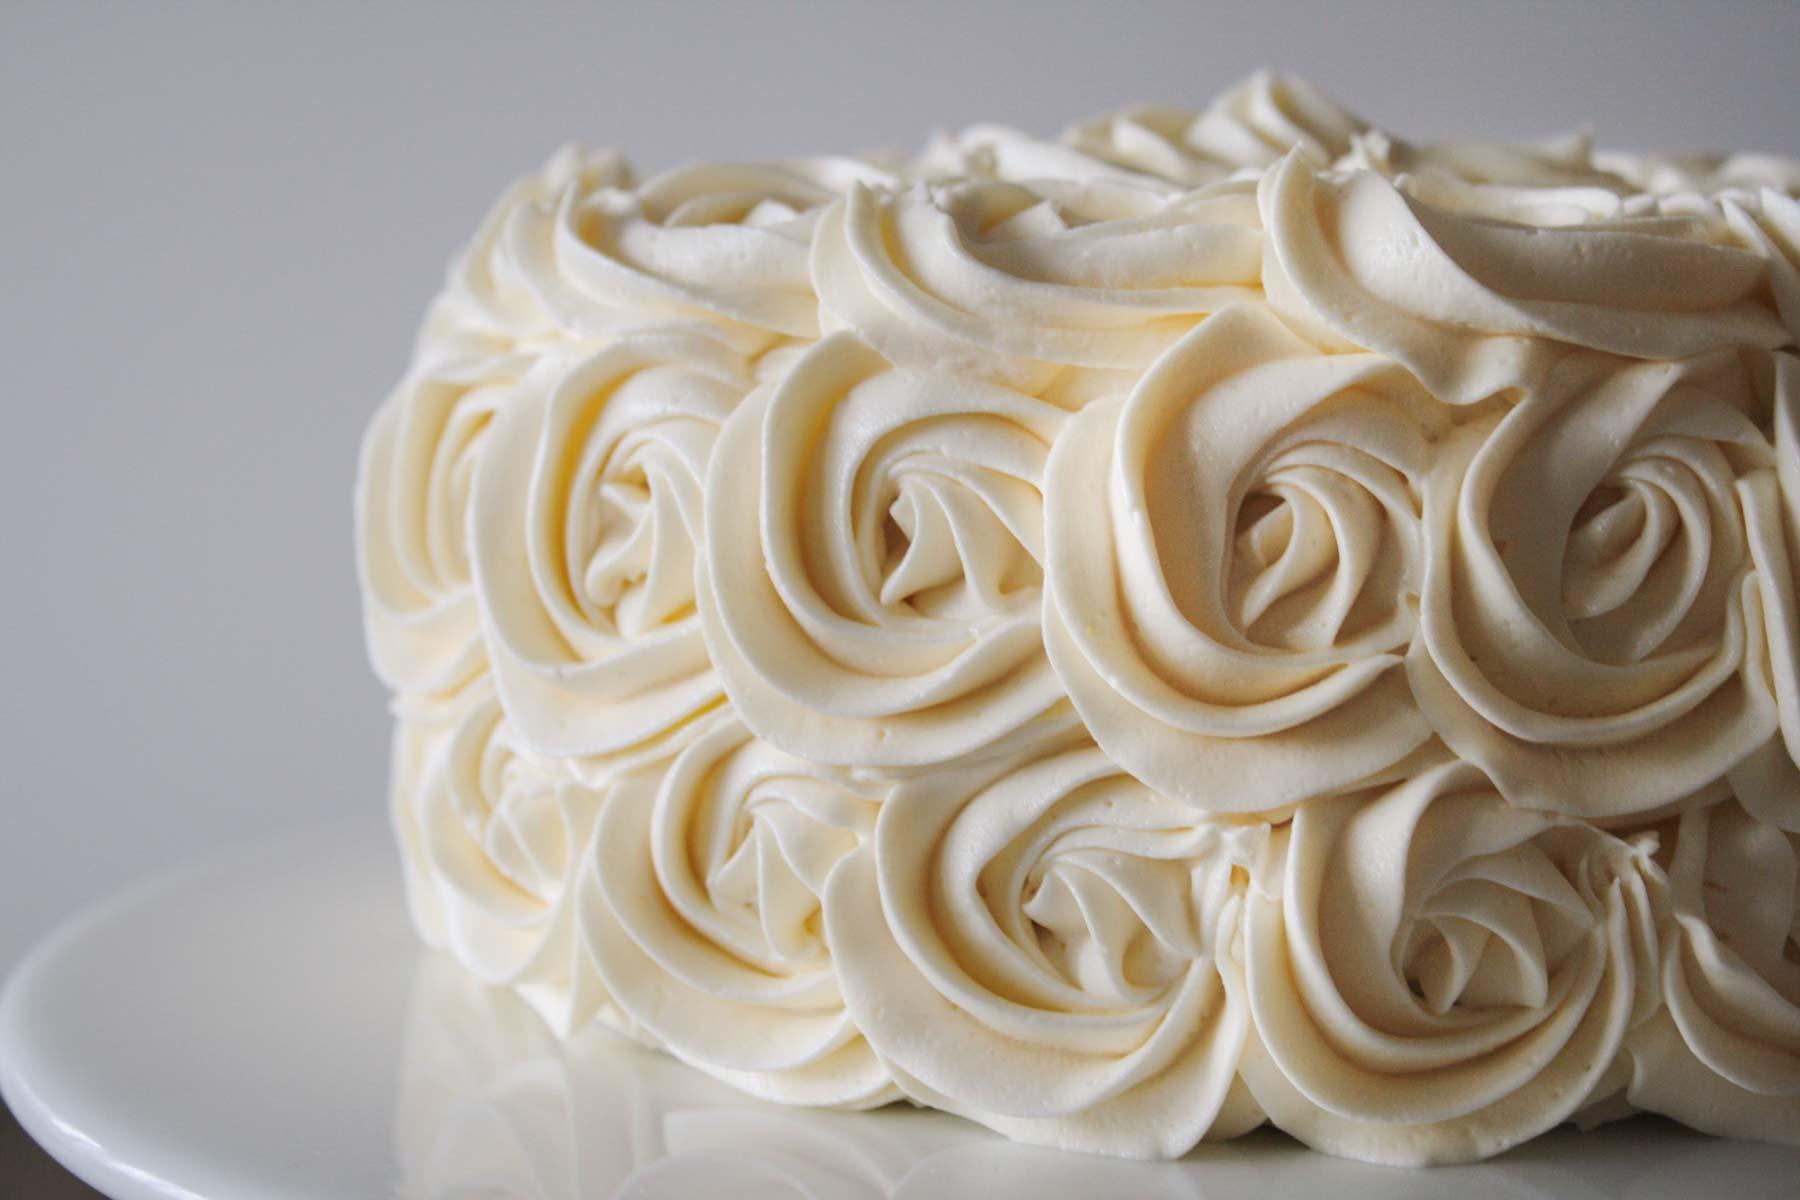 whipping cream là gì whipping cream là gì Whipping Cream là gì? Công dụng và phân biệt với Topping Cream whipping cream la gi 11